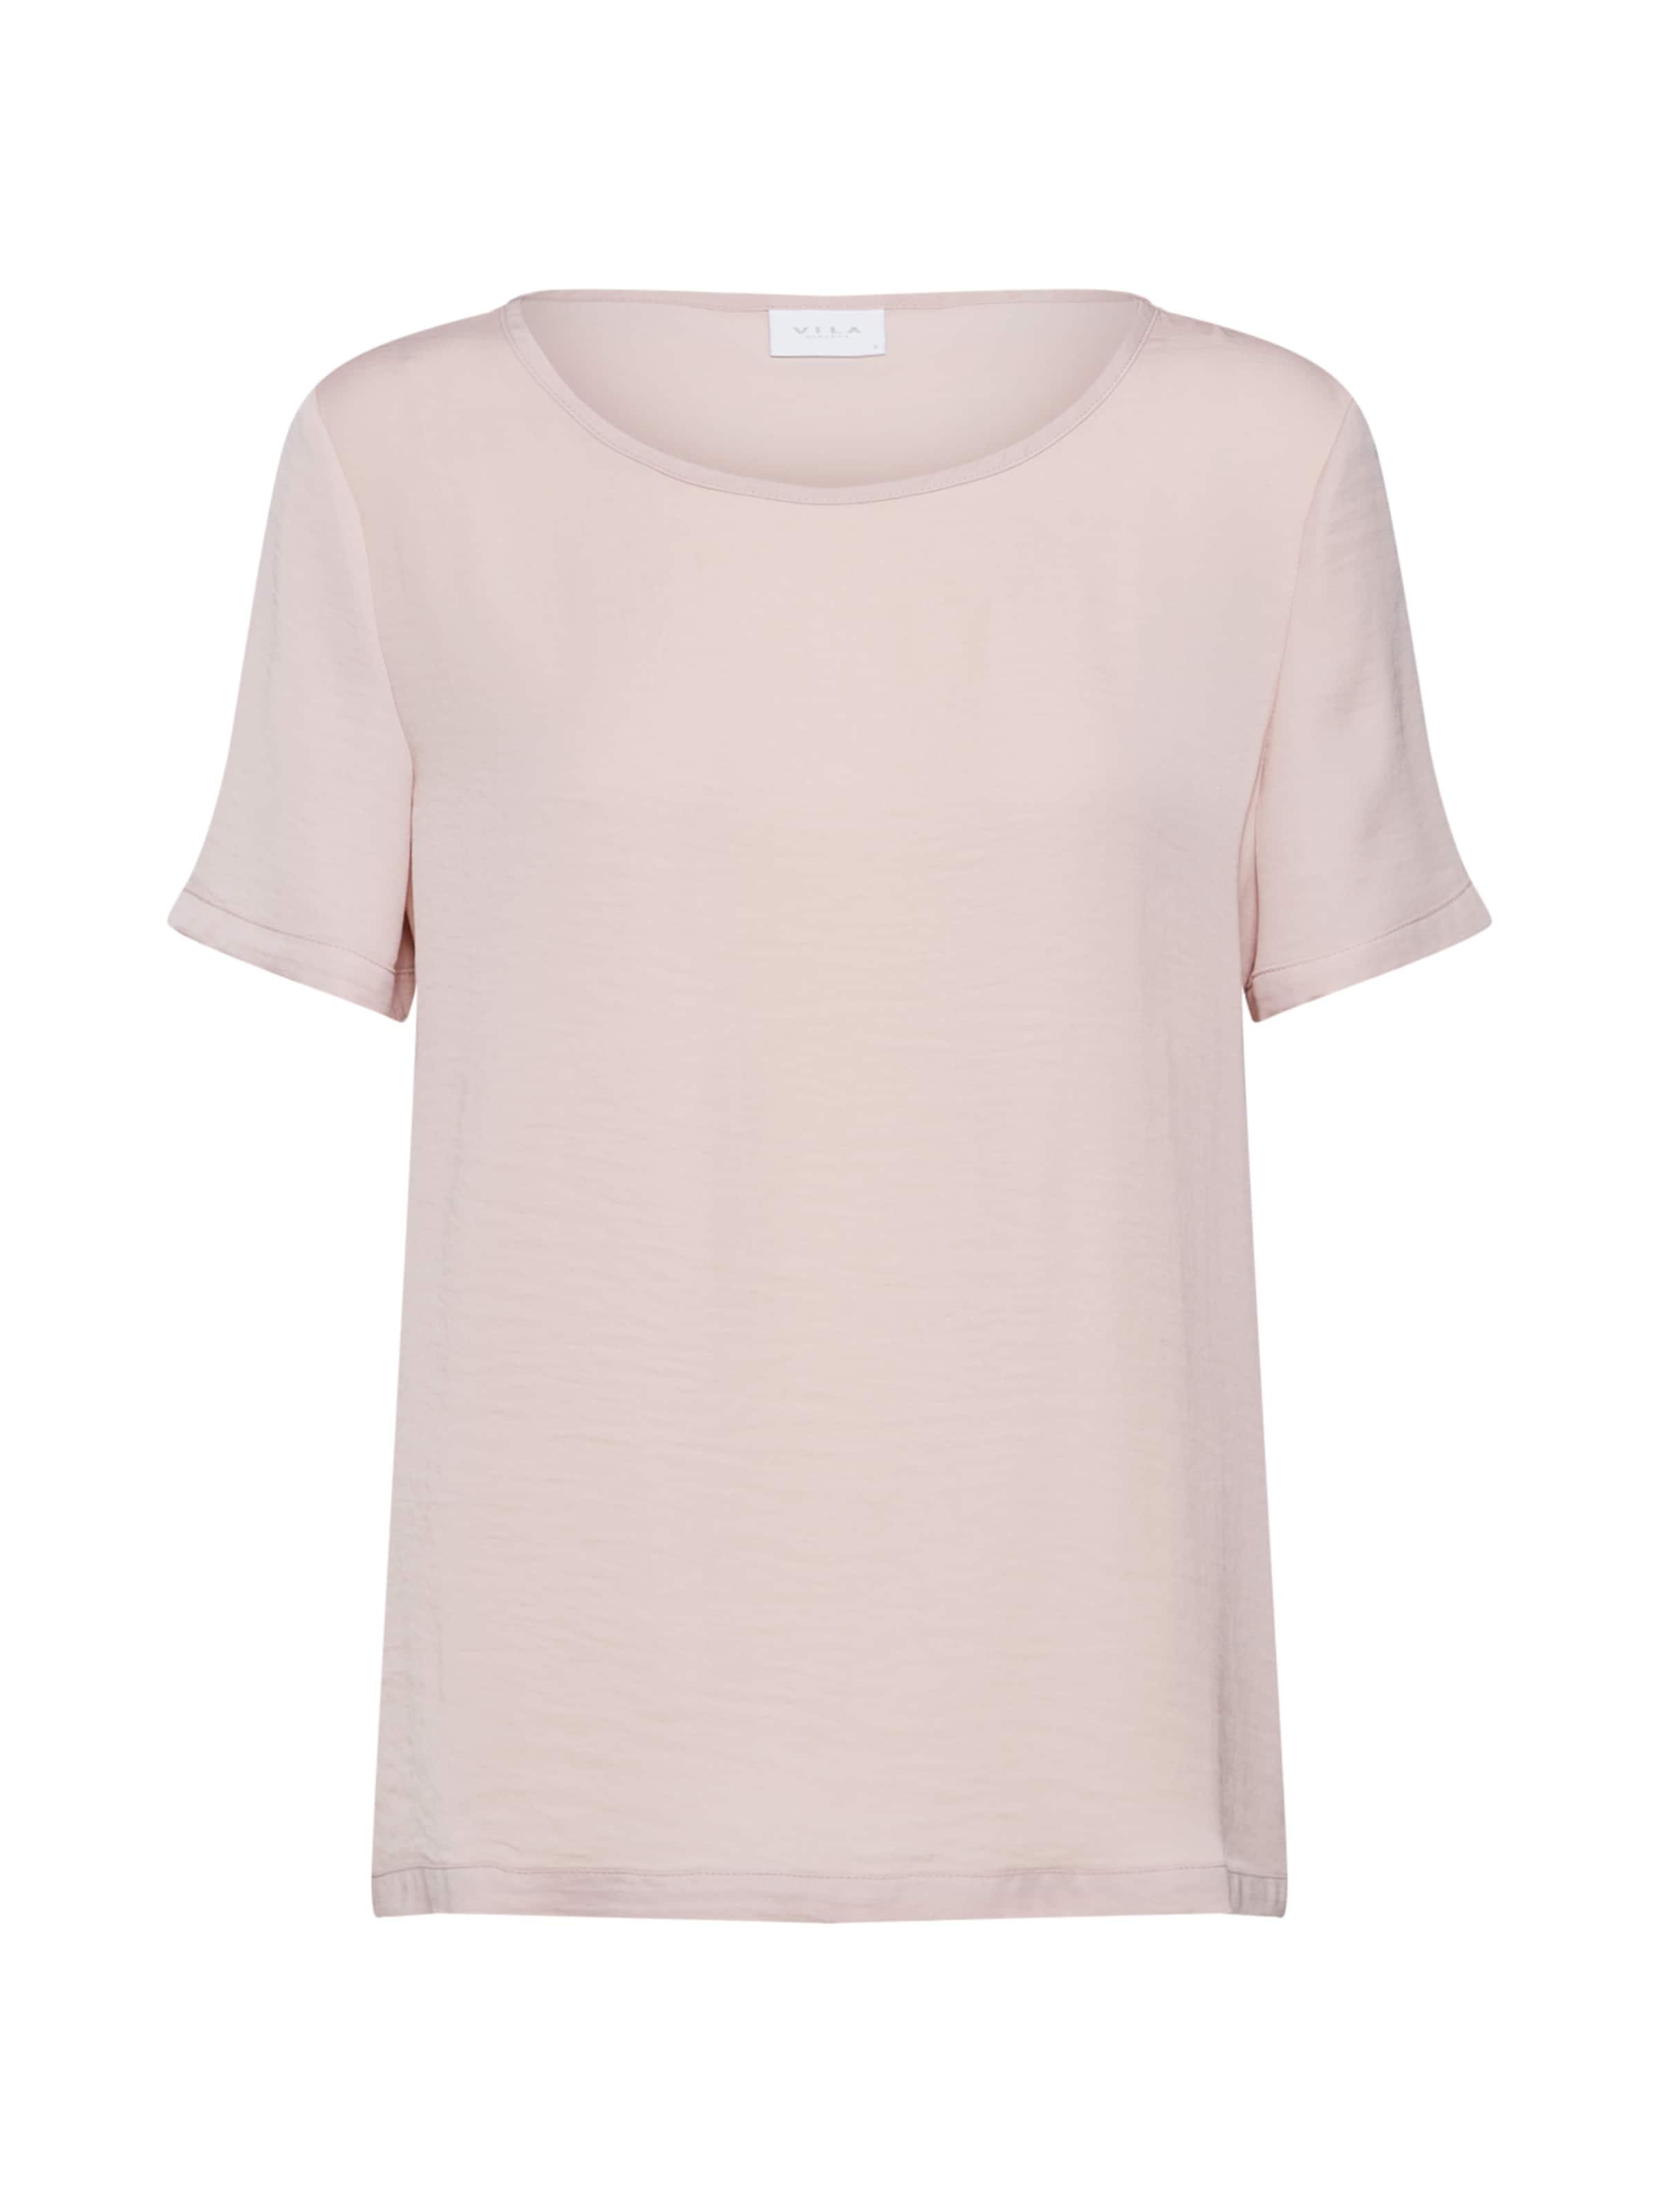 'vimelli' Vila shirt T En Rosé 5RA4jL